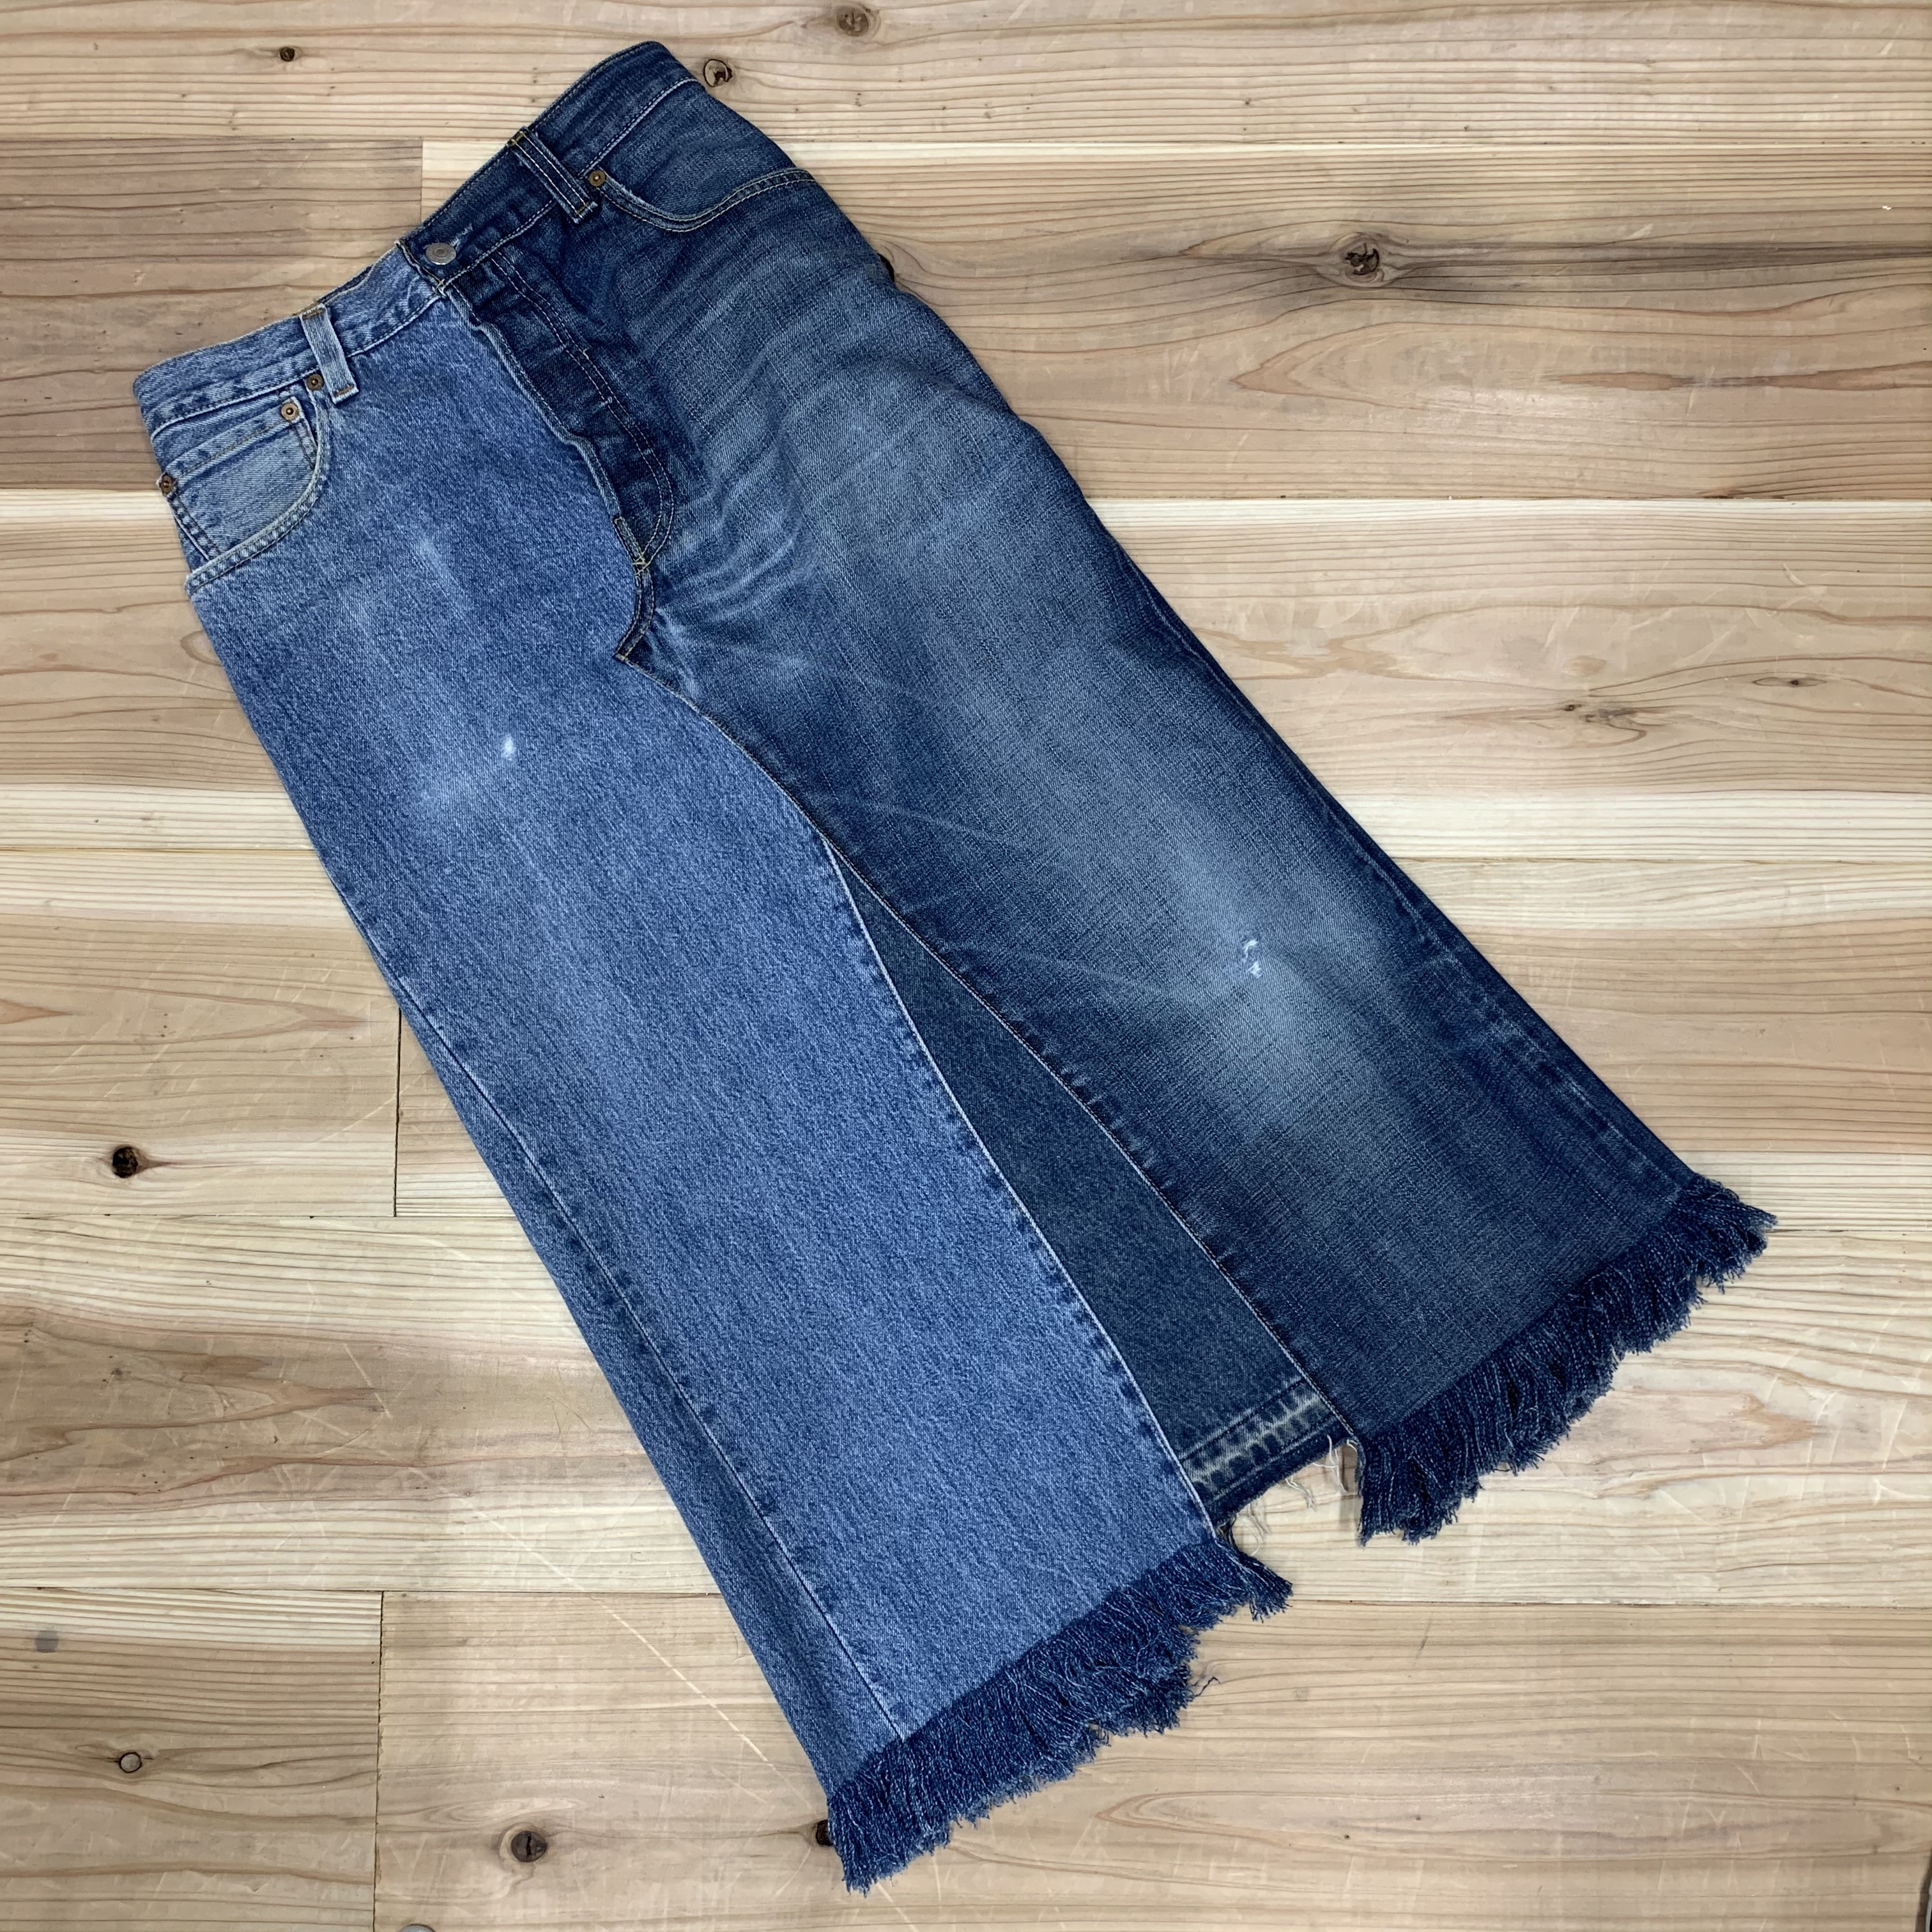 CaNARi original remake denim skirt